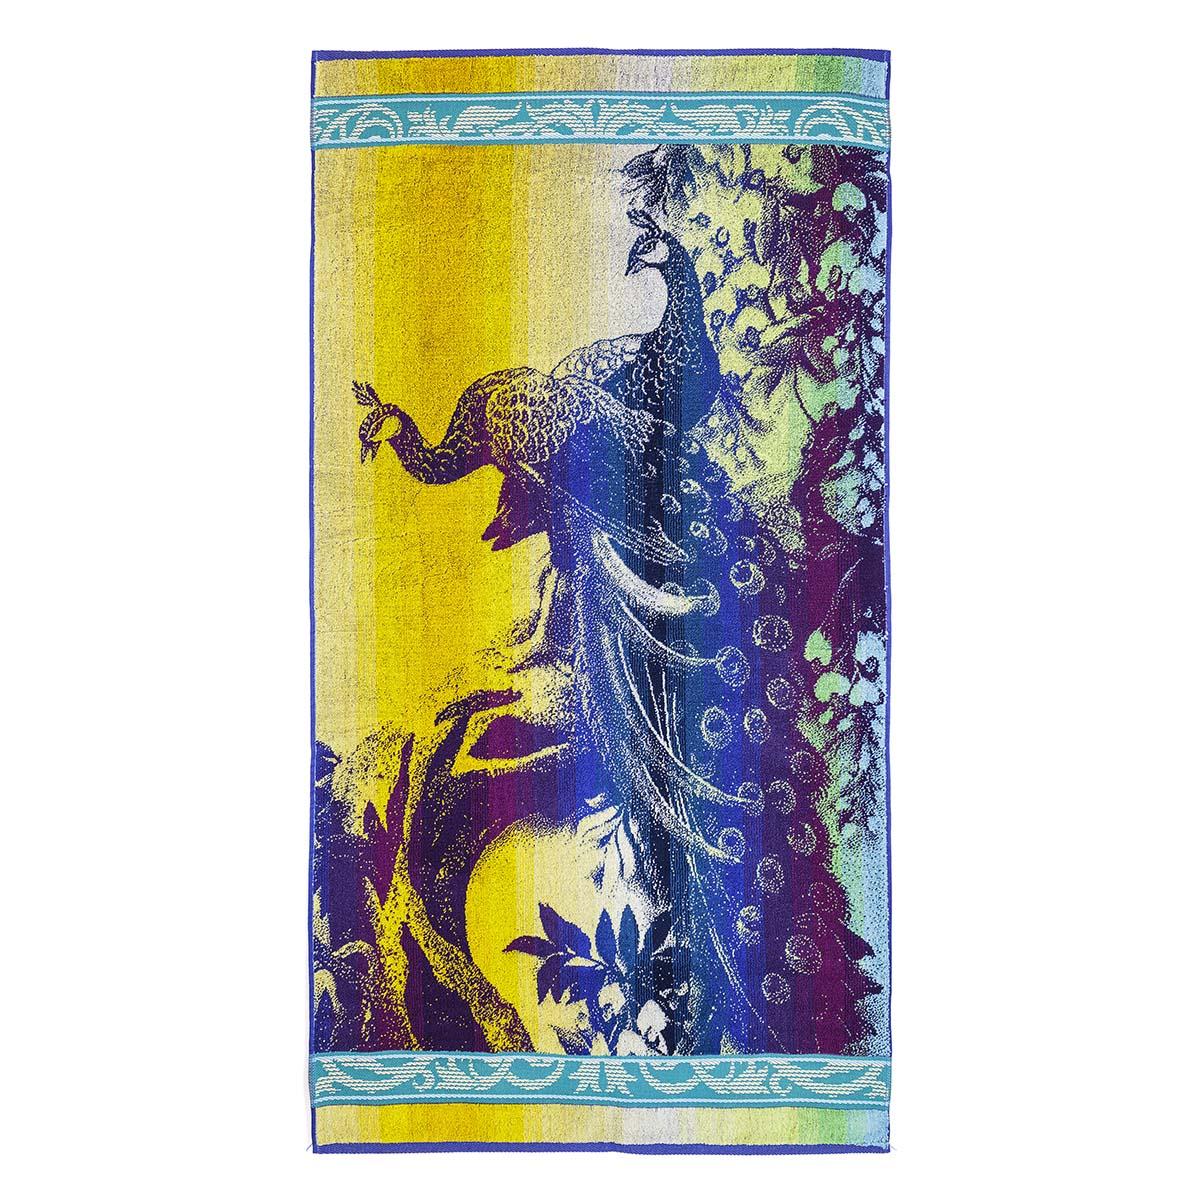 Полотенце Павлины, размер 70х140 см.Махровые полотенца<br><br><br>Тип: Полотенце<br>Размер: 70х140<br>Материал: Махра